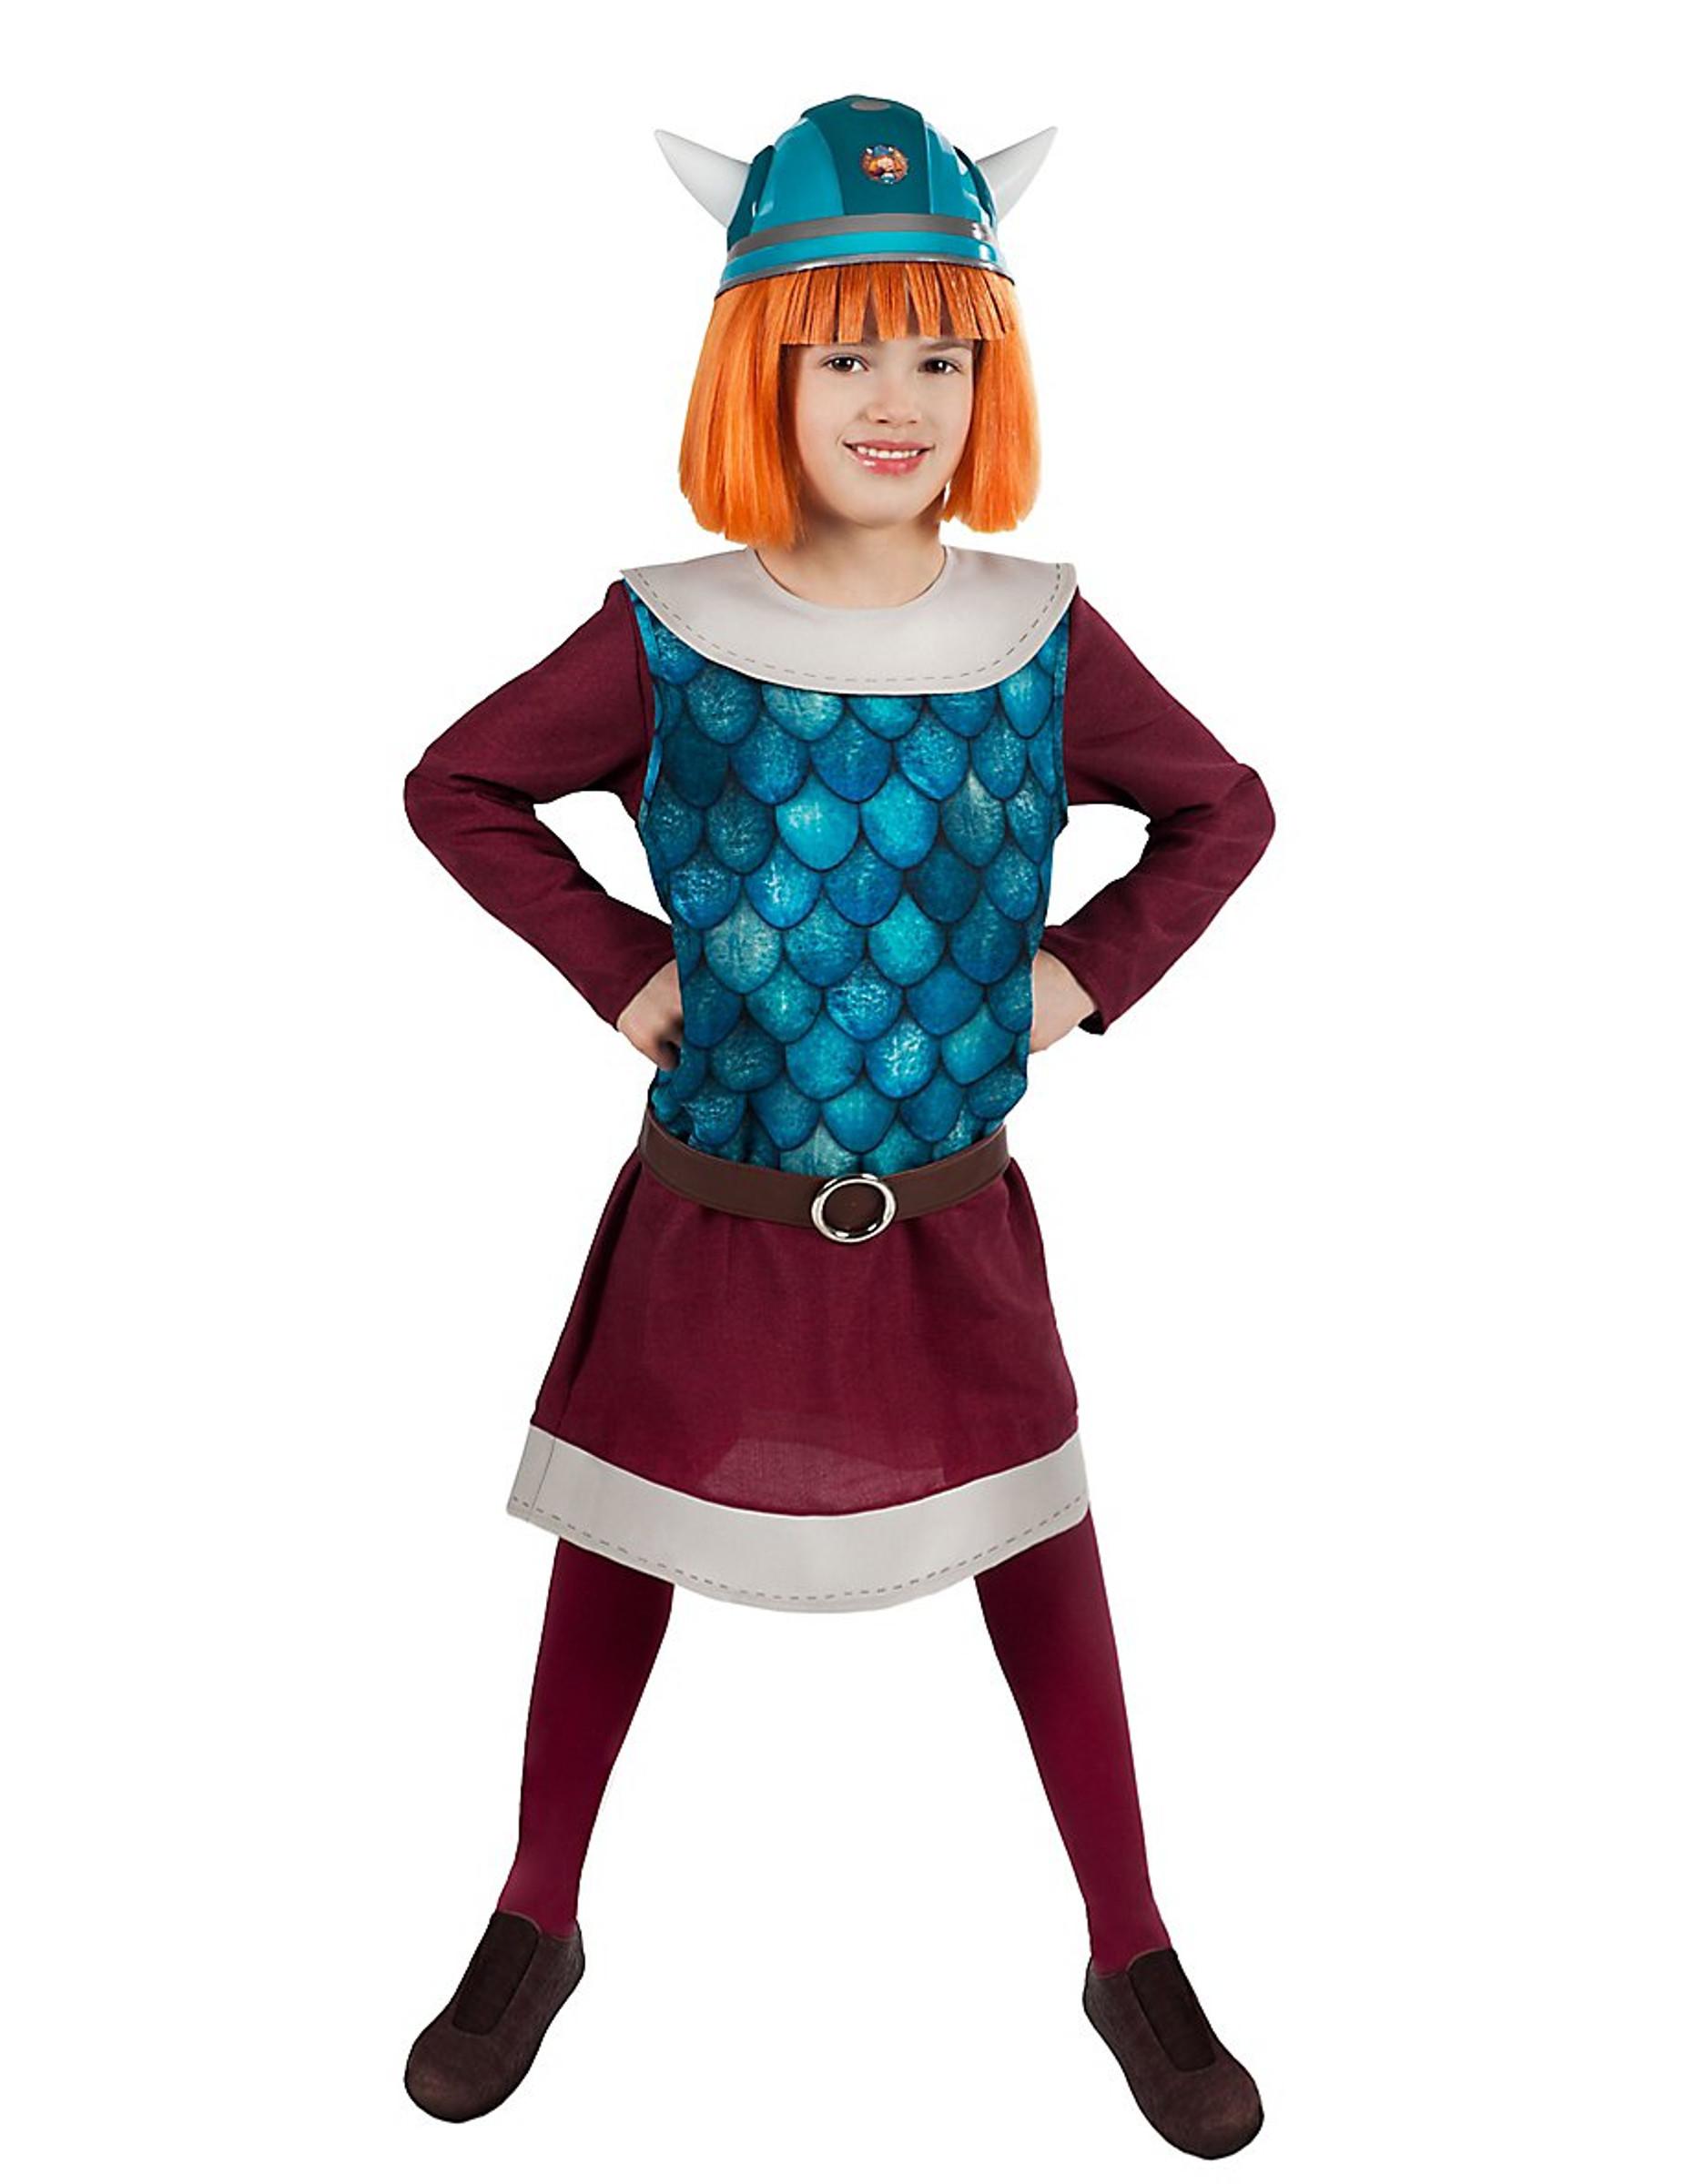 Vikingen Vicky™ strømpebukser pige